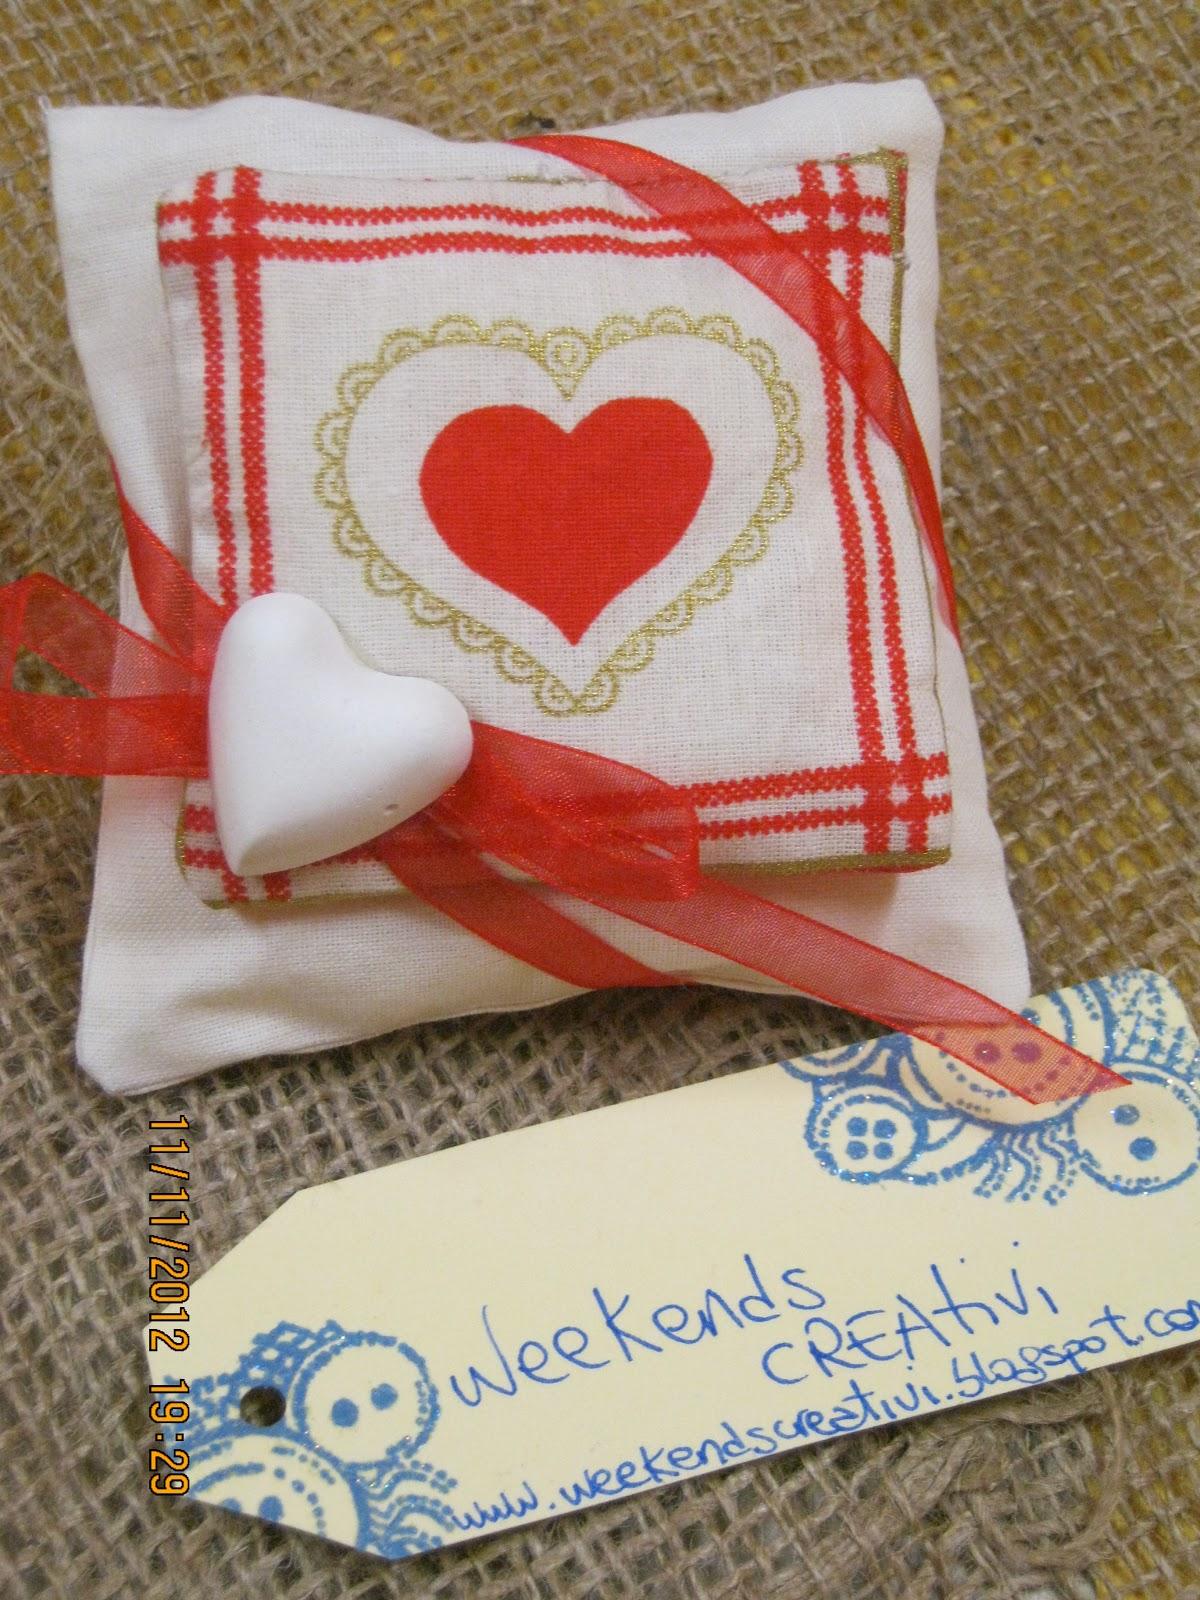 Week ends creativi cuscinetti profumosi idee natalizie - Idee shabby da creare ...